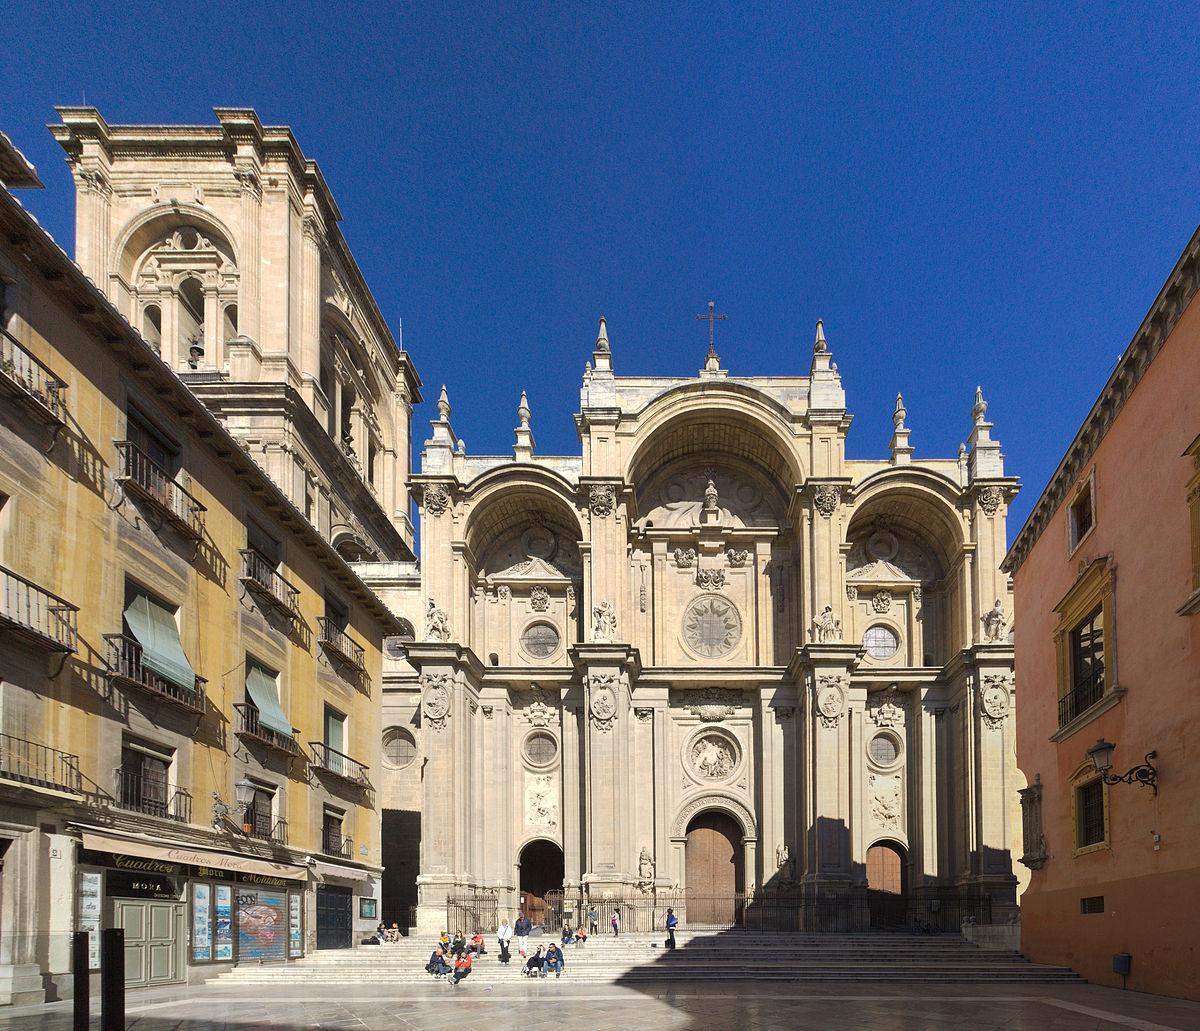 Catedral de Granada - Wikipedia, la enciclopedia libre